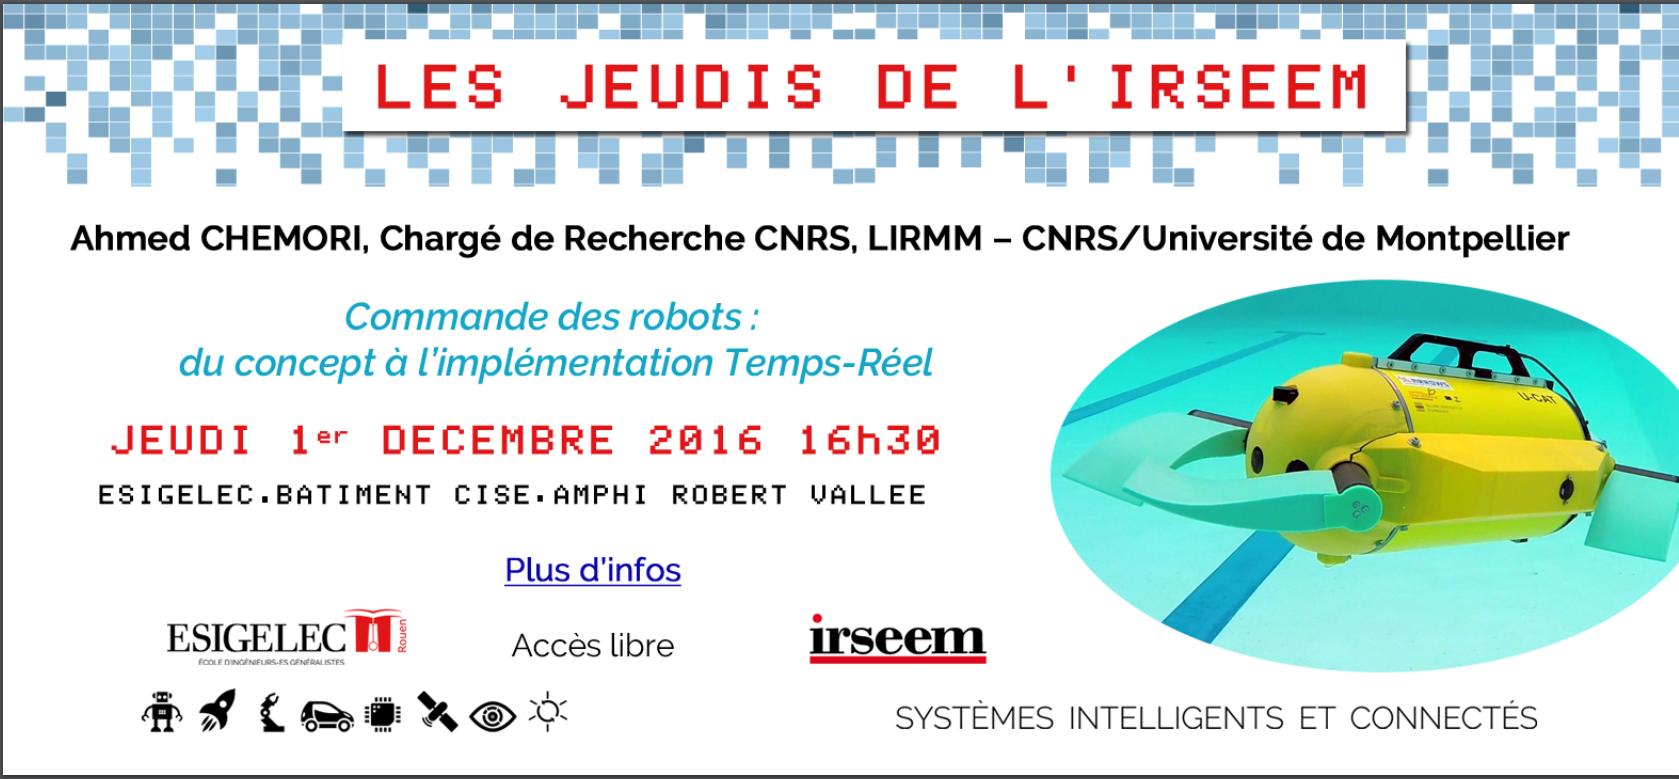 Jeudis de l'IRSEEM : Conférence de Ahmed CHEMORI le 01/12/2016 à l'IRSEEM